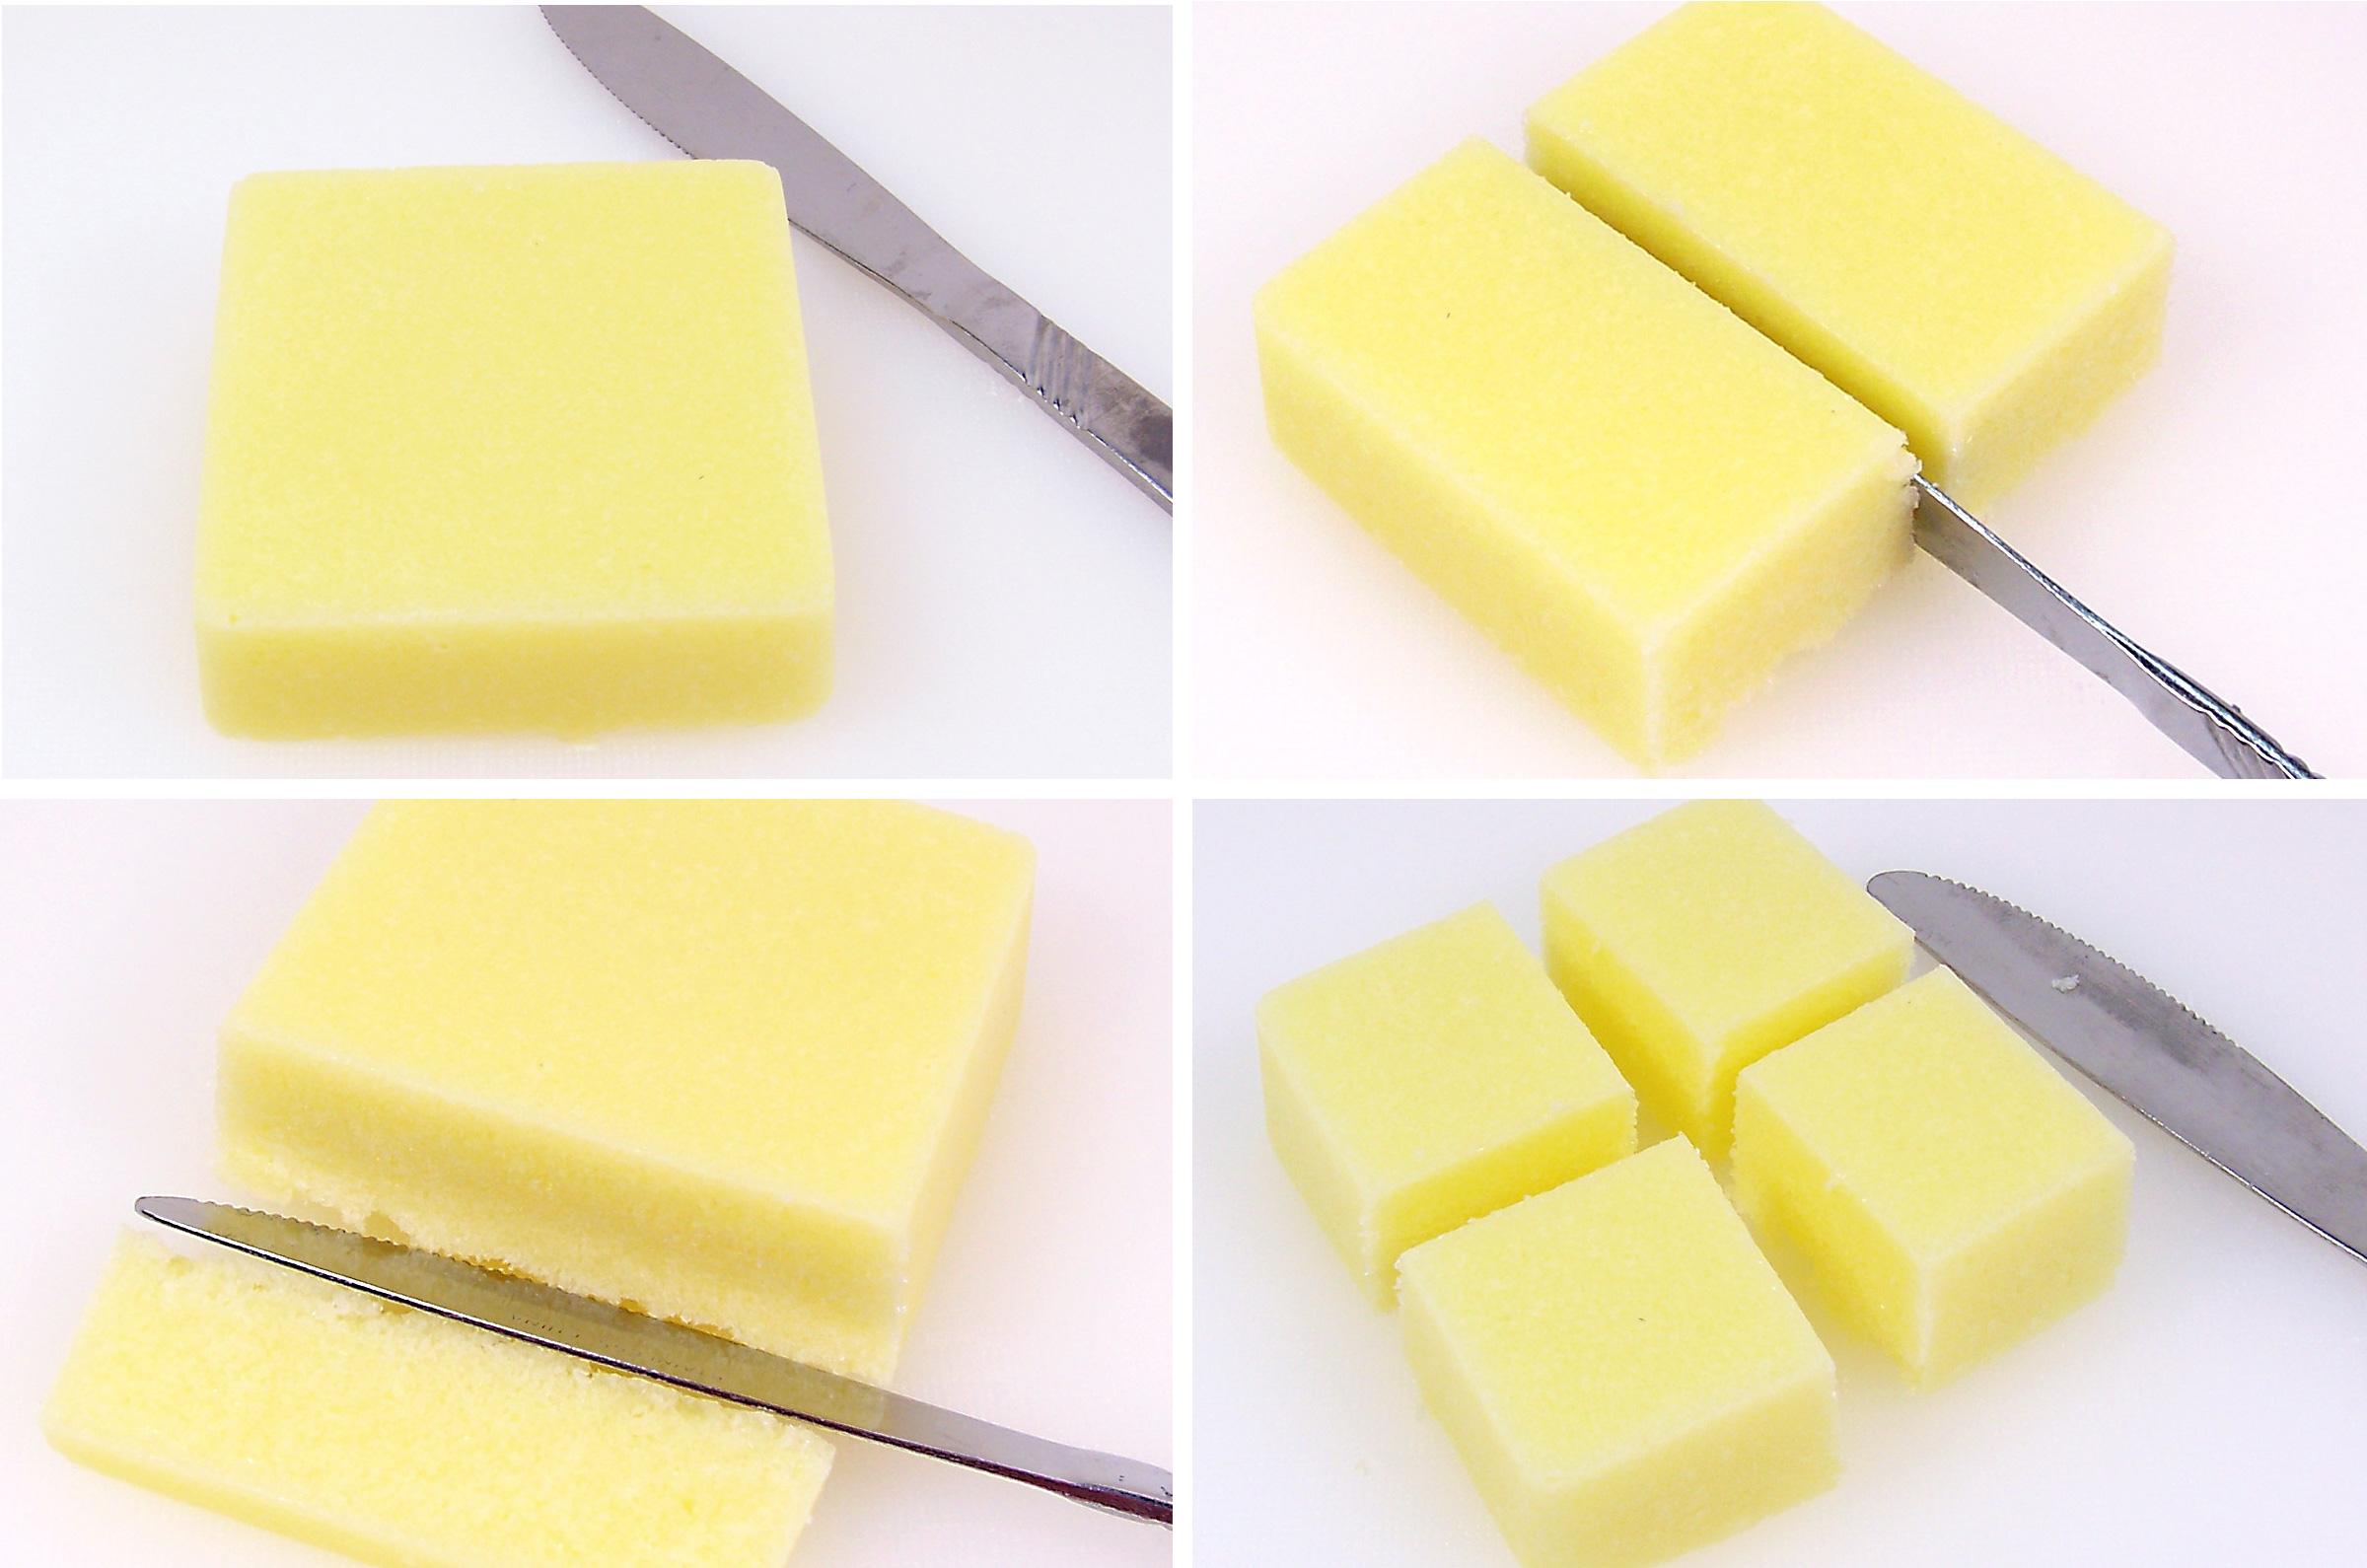 remove, trim, cut into 4 pieces